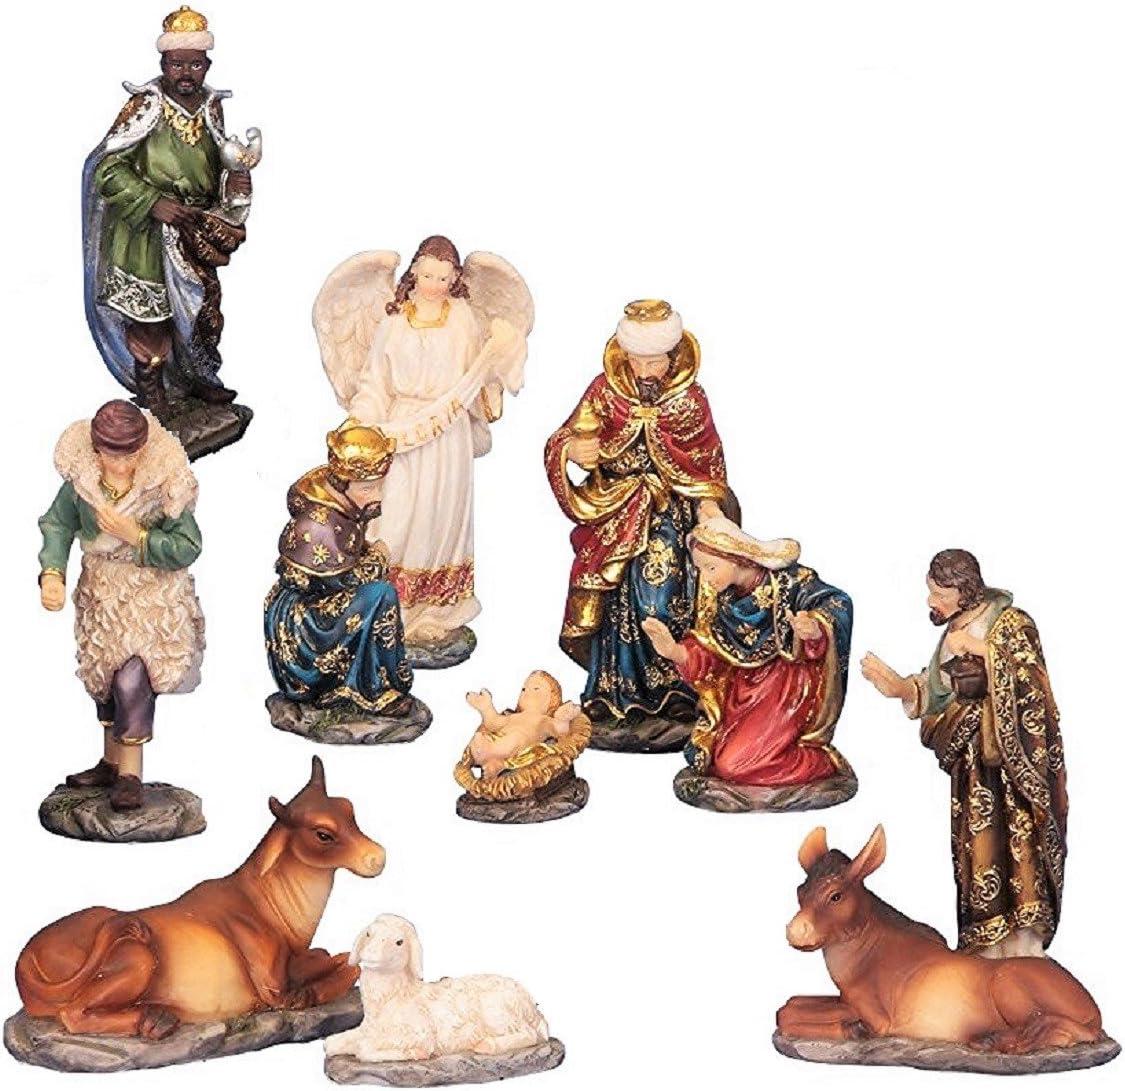 11 Piece Nativity Figurine Set 14 5 Cm Amazon Co Uk Kitchen Home